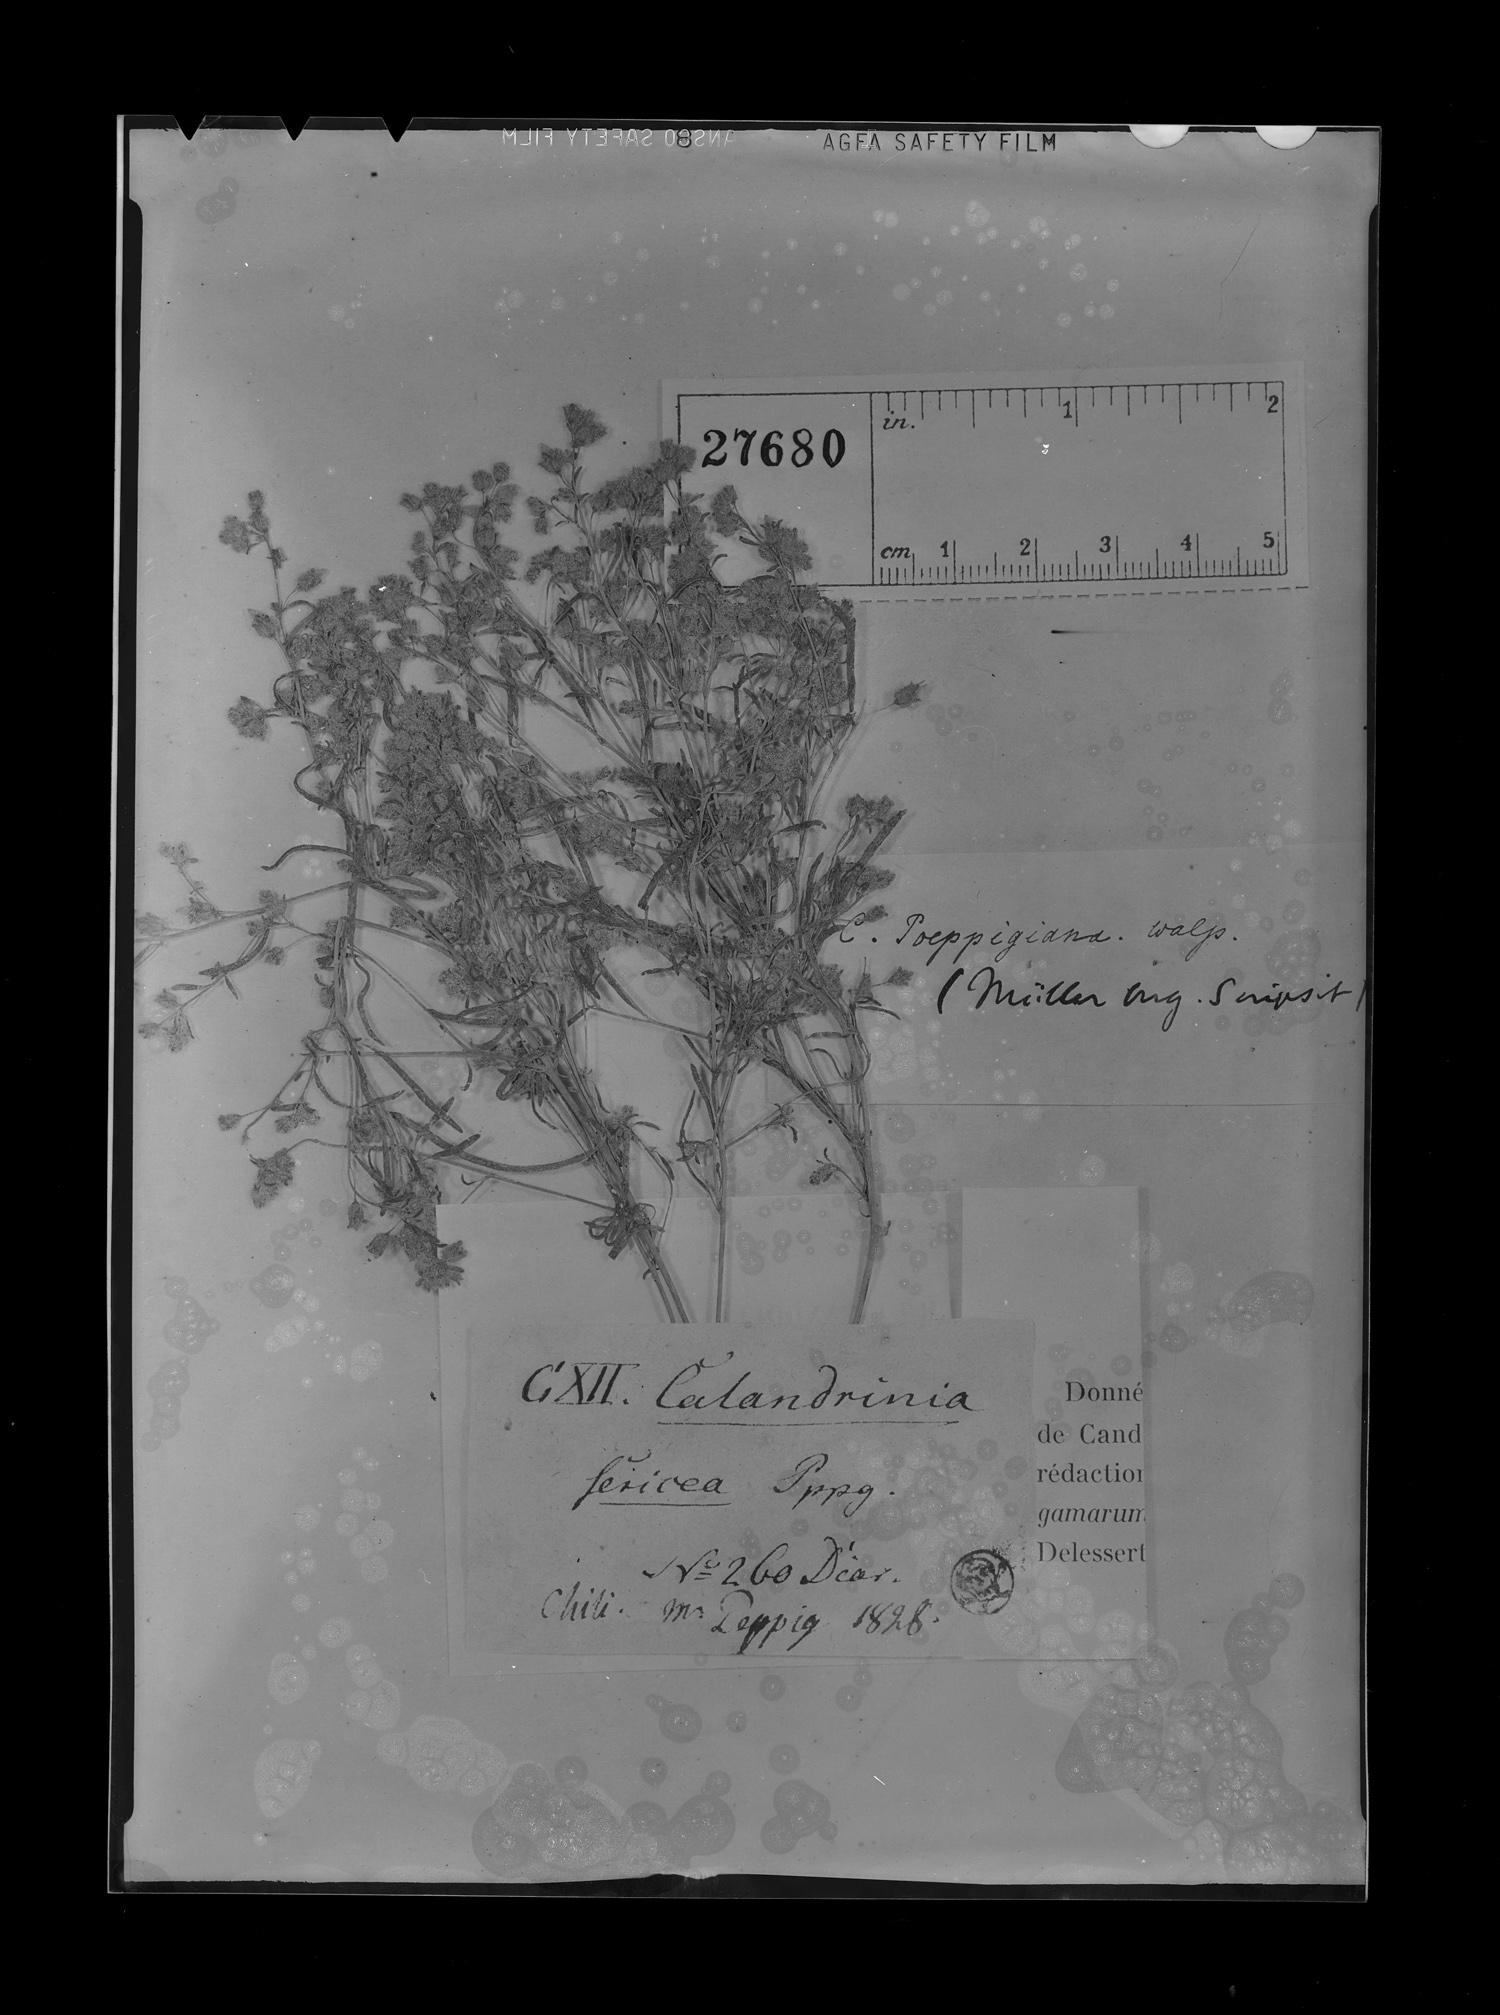 Montiopsis image